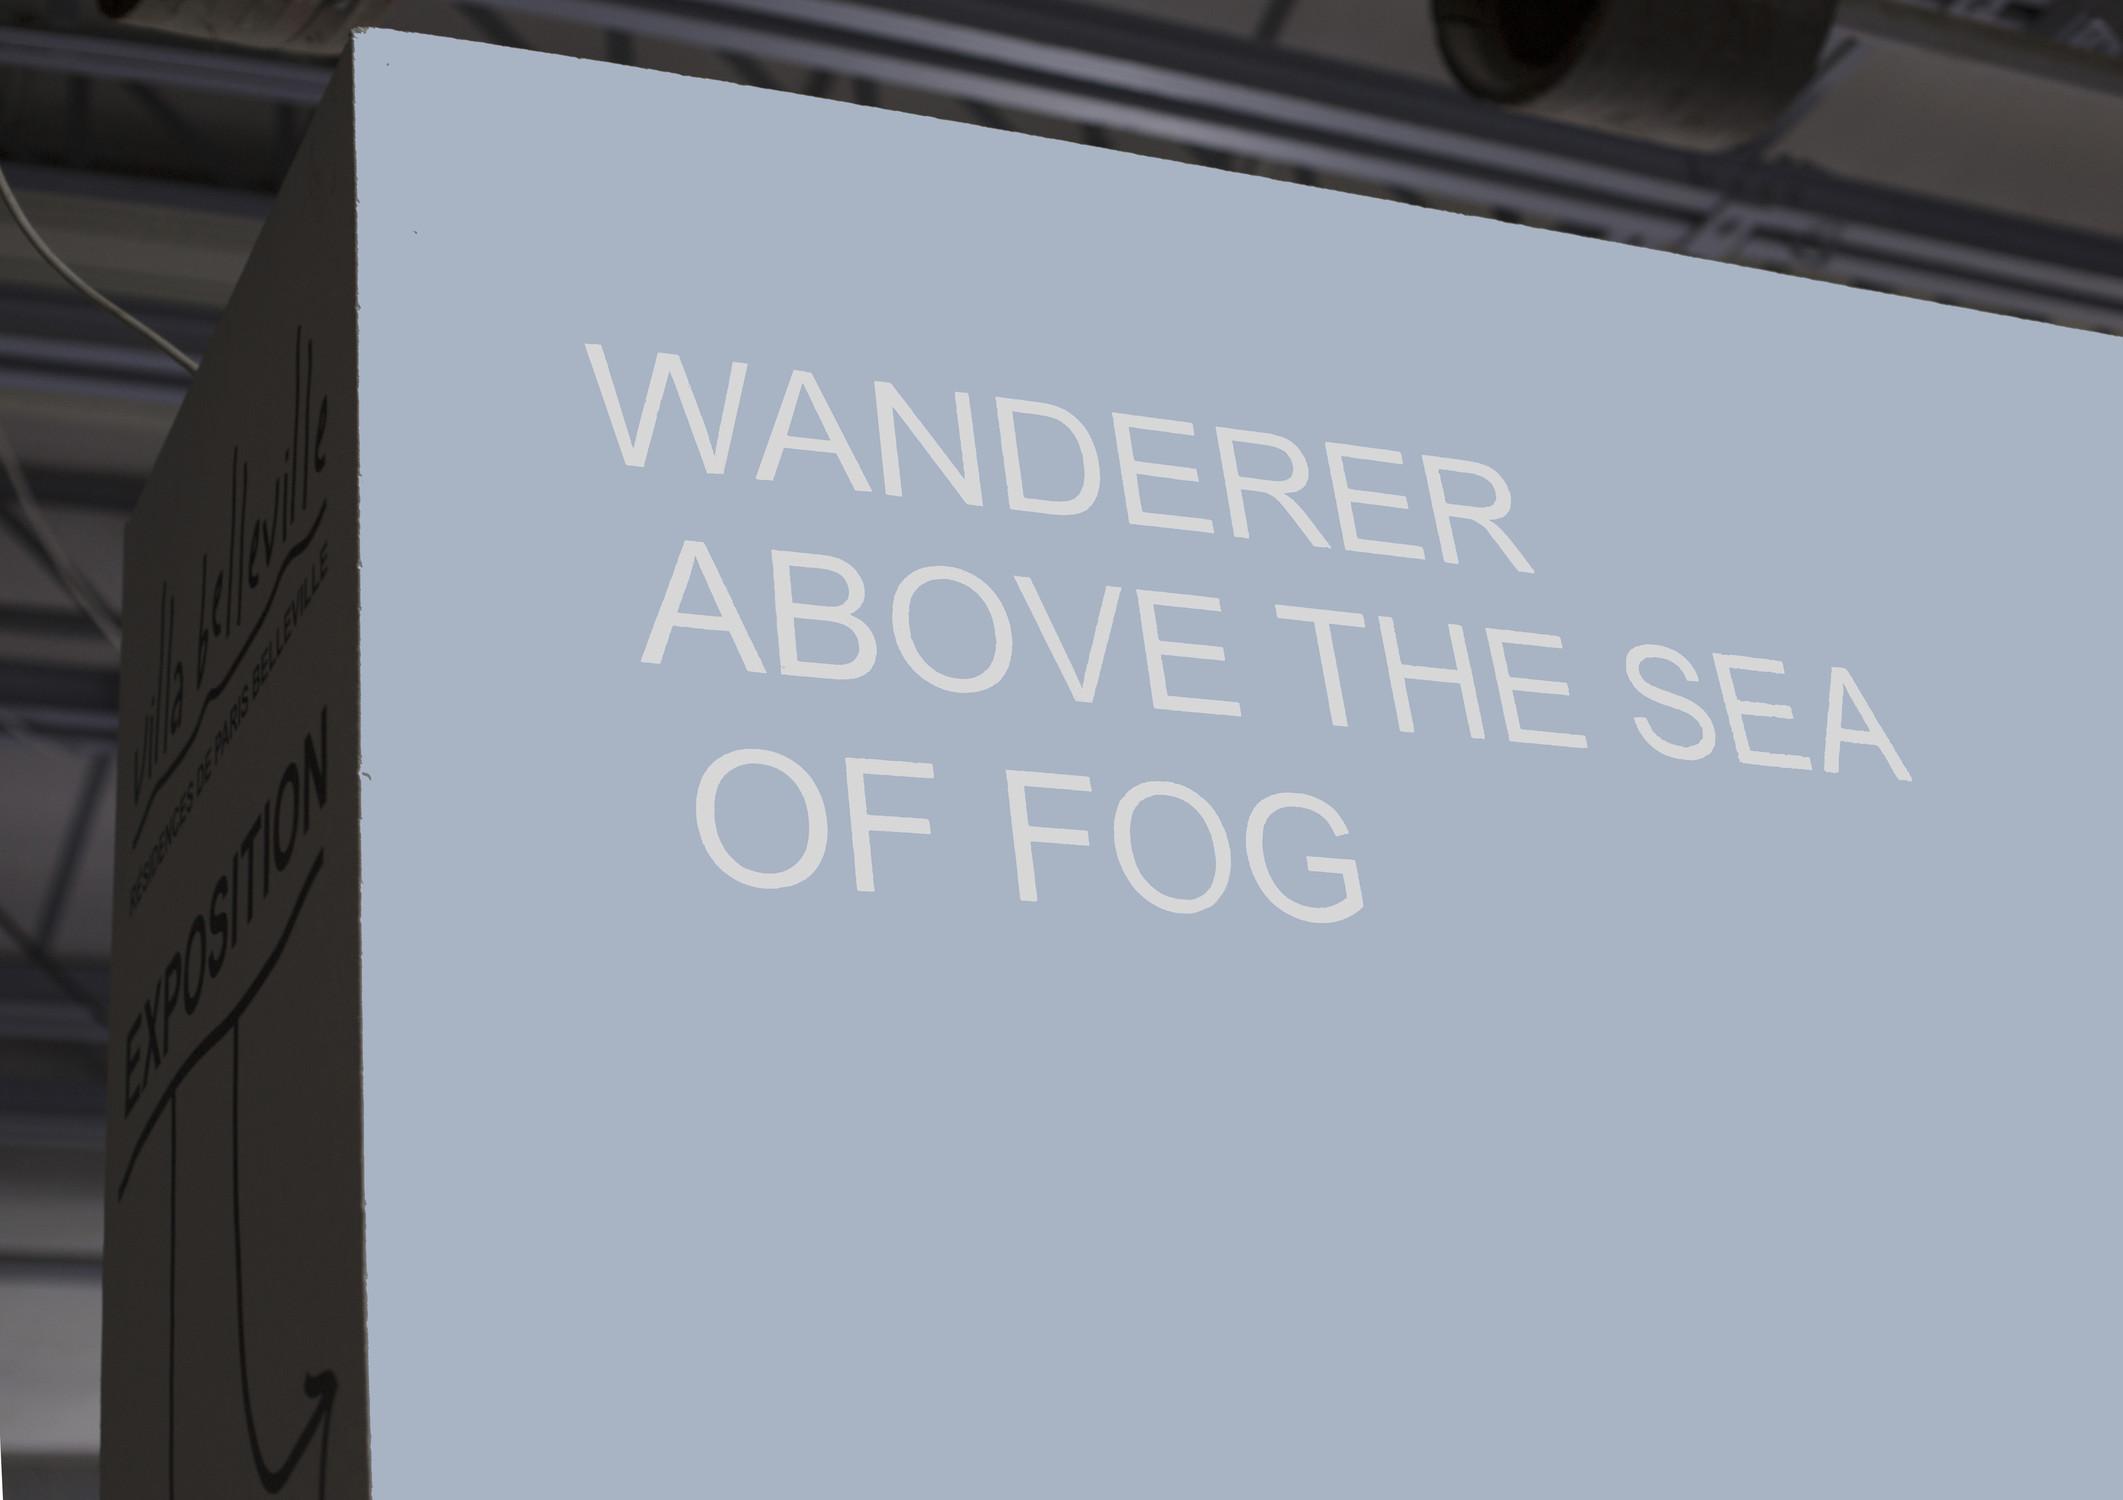 Wanderer above the sea of fog - © Bigtime.